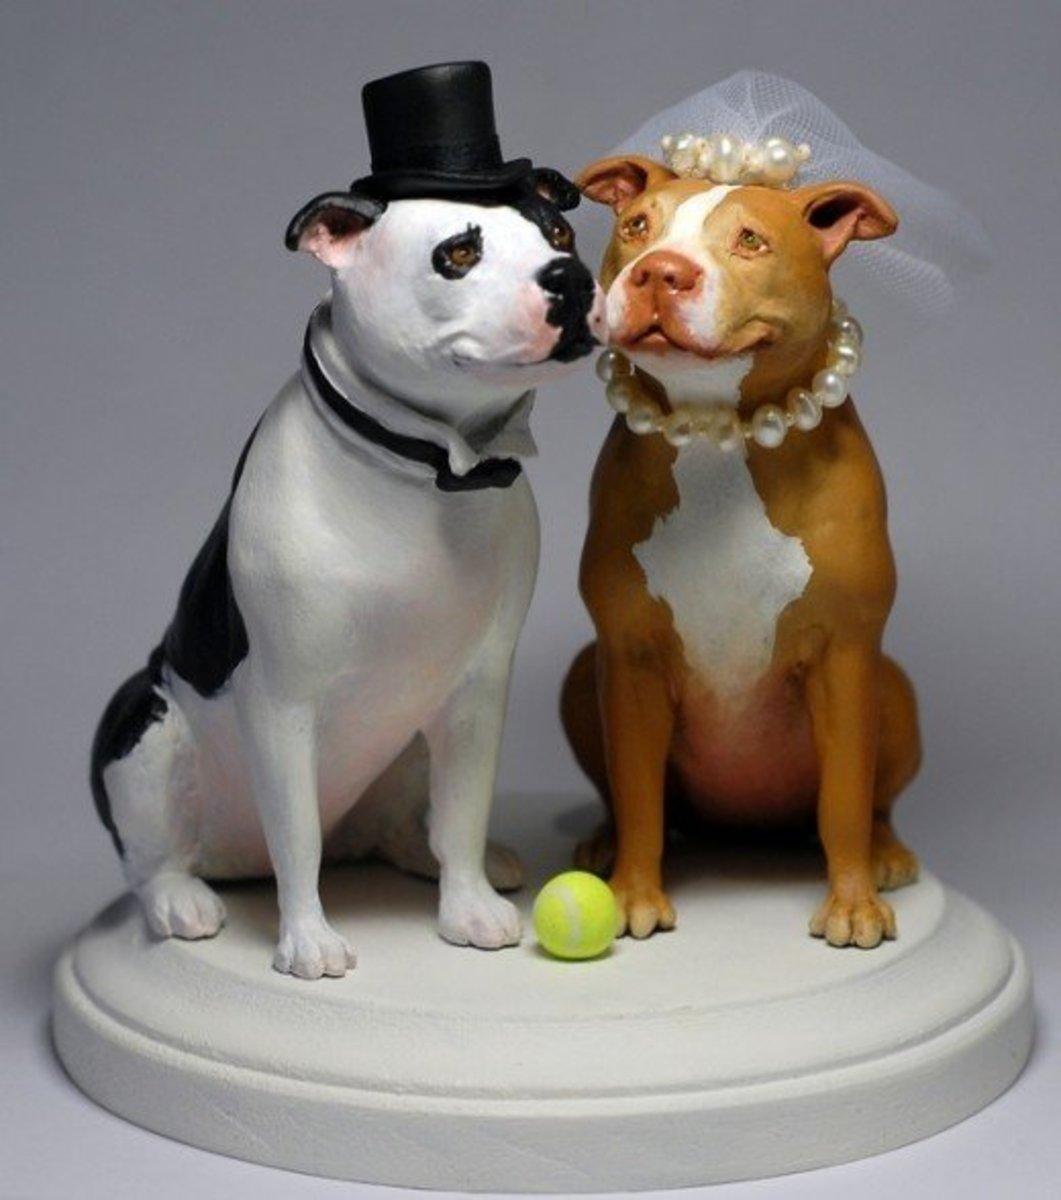 Sandy and Sheeba the pit bulls.